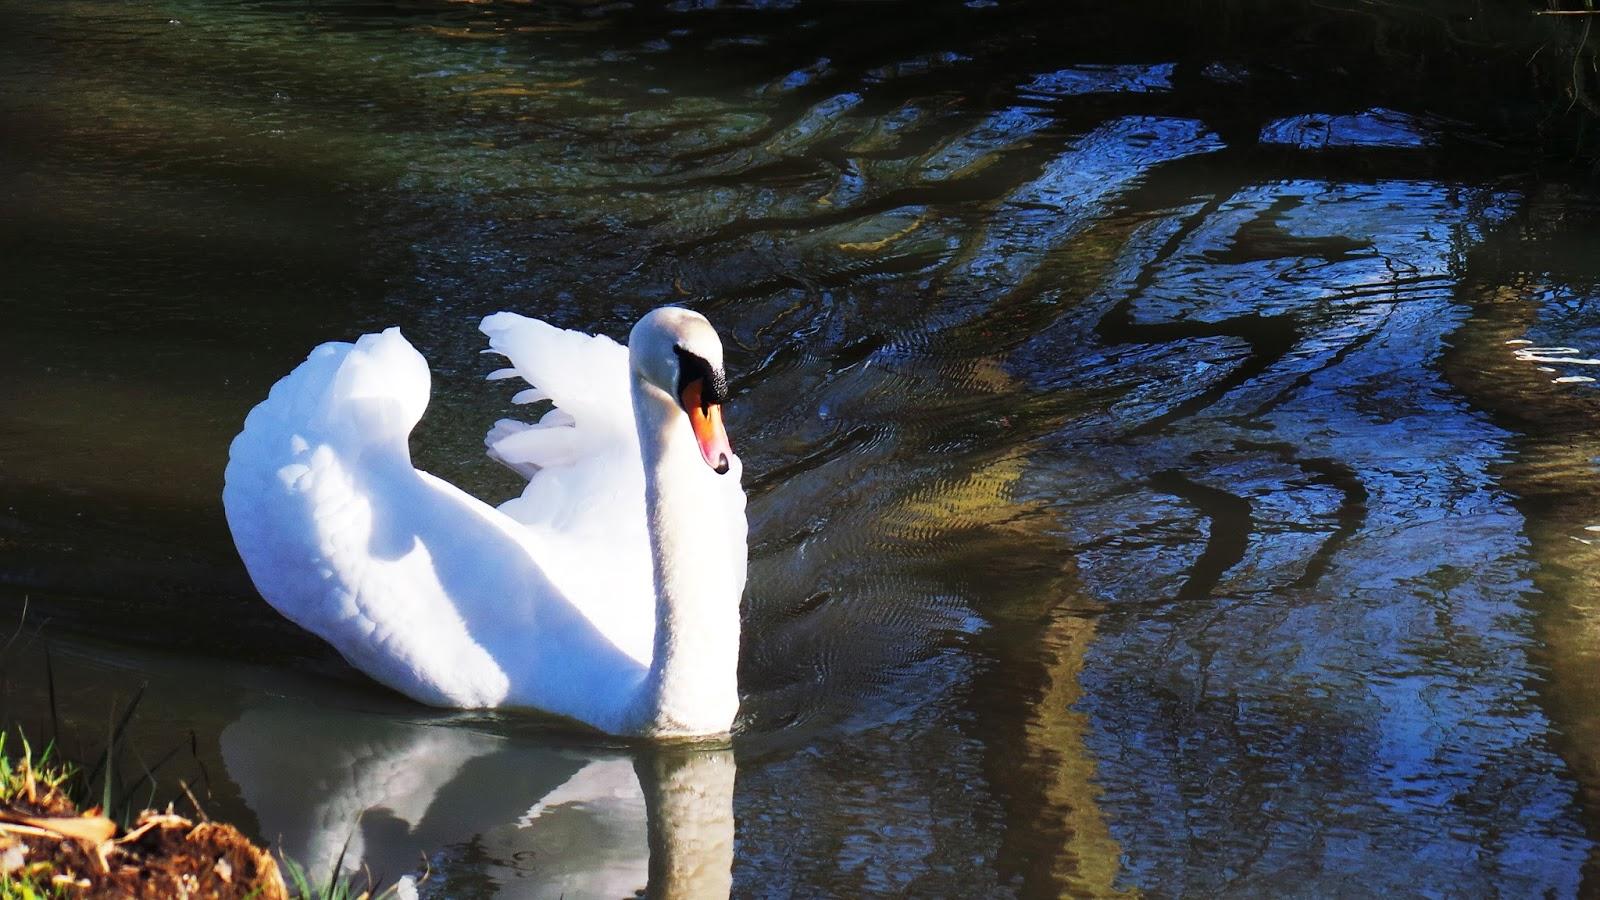 Review / Blog Billing Aquadrome Holiday Park, Northamptonshire